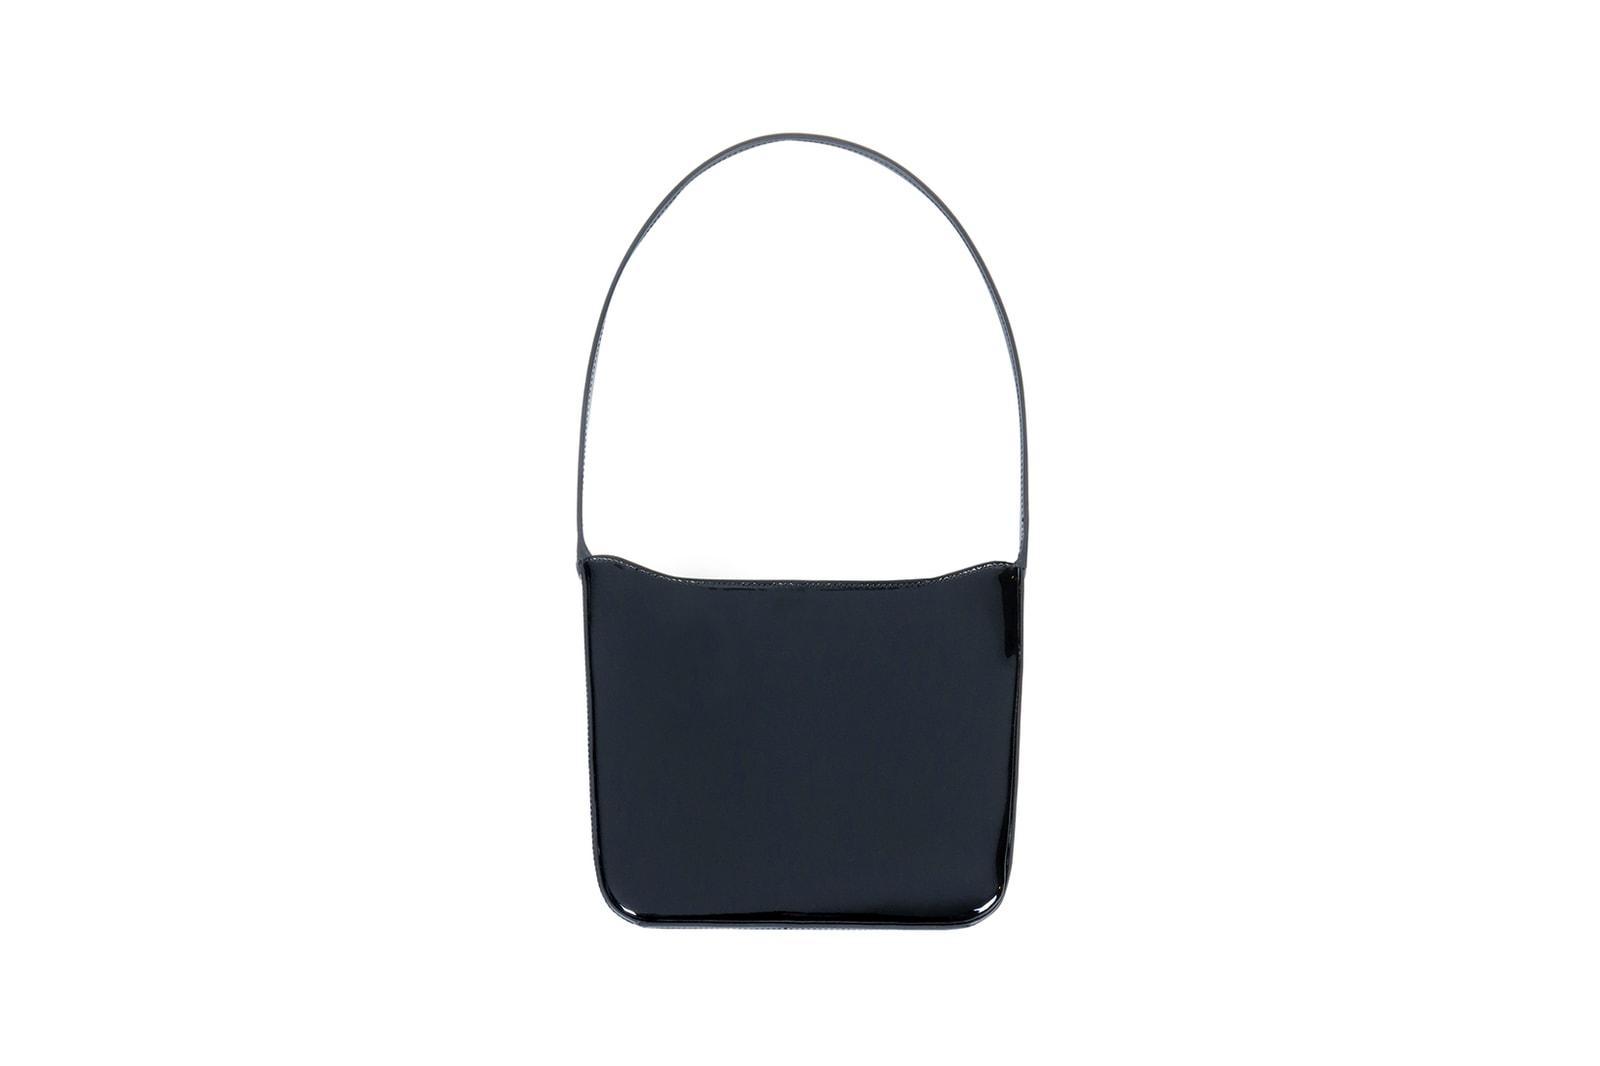 Sandy Liang Auntie Bag Handbag Black